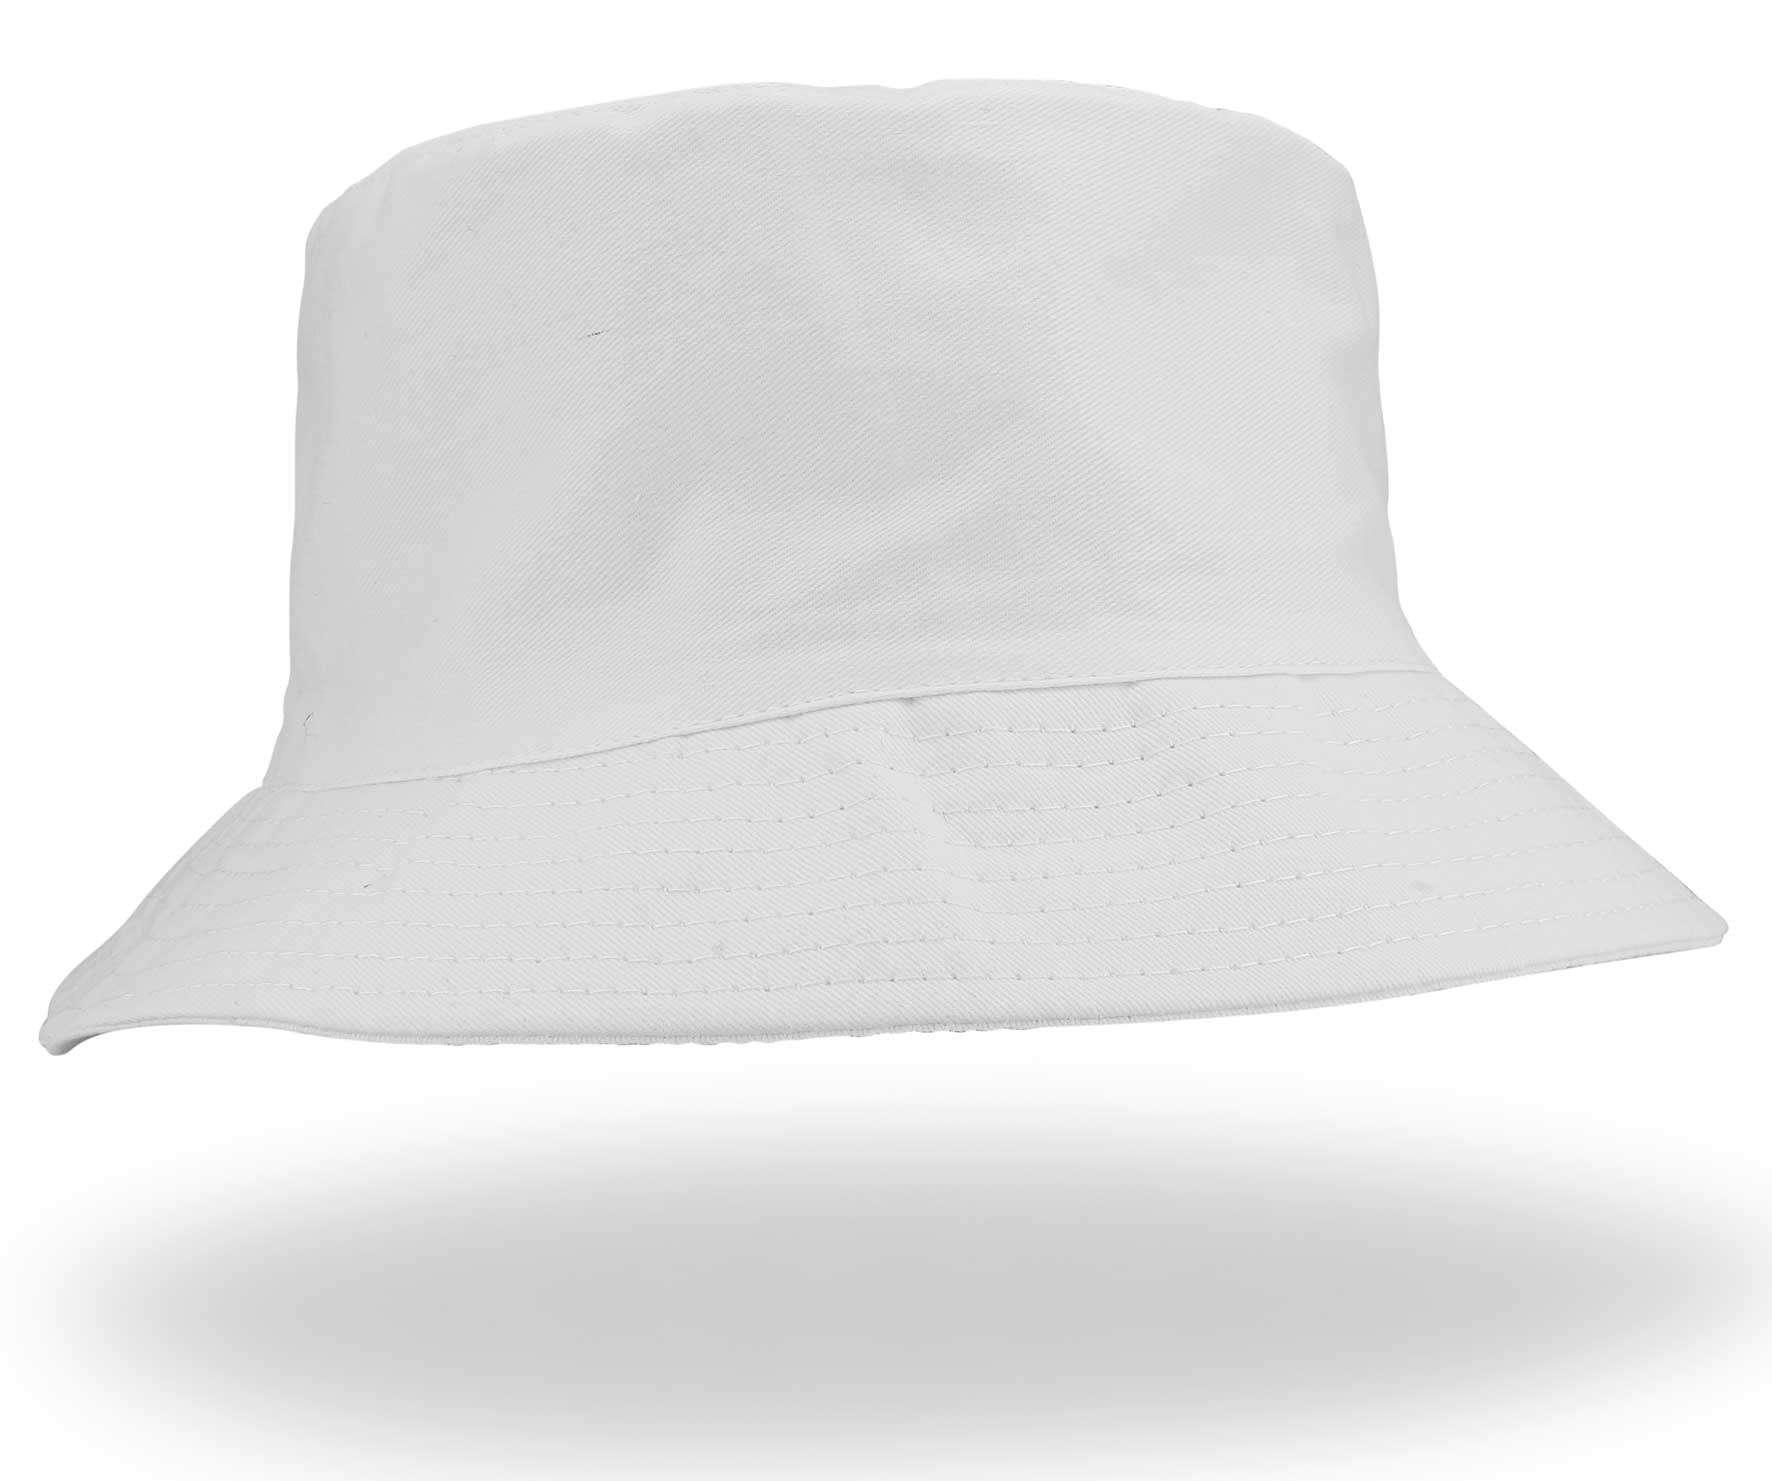 2b31680adb9 Unisex White Sun Hat - Emsmorn Bowlswear